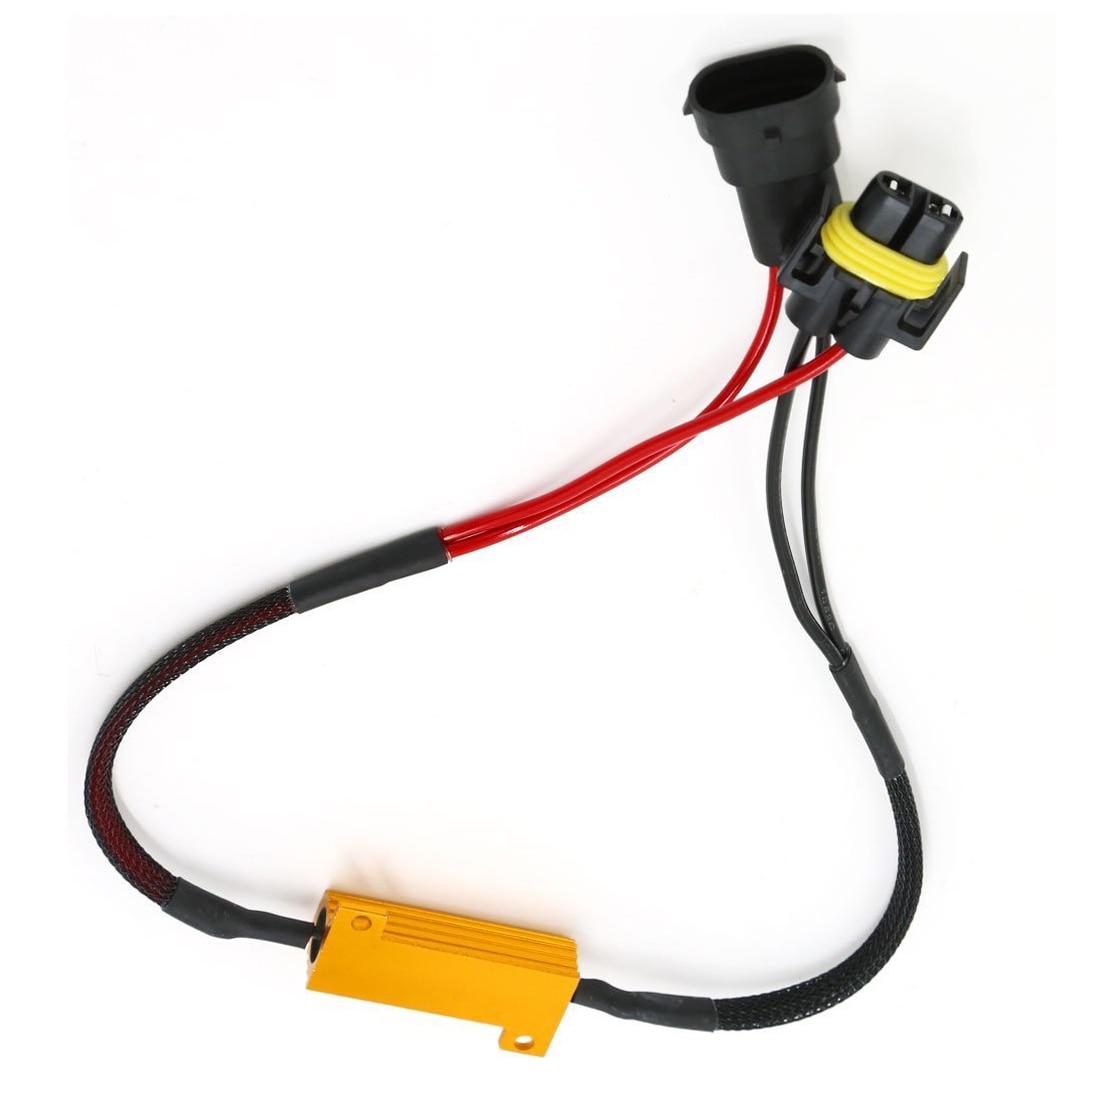 h11 led load resistor wiring harness wiring diagram library wsfs hot 2 pcs h11 error load resistor bypass wiring harnesswsfs hot 2 pcs h11